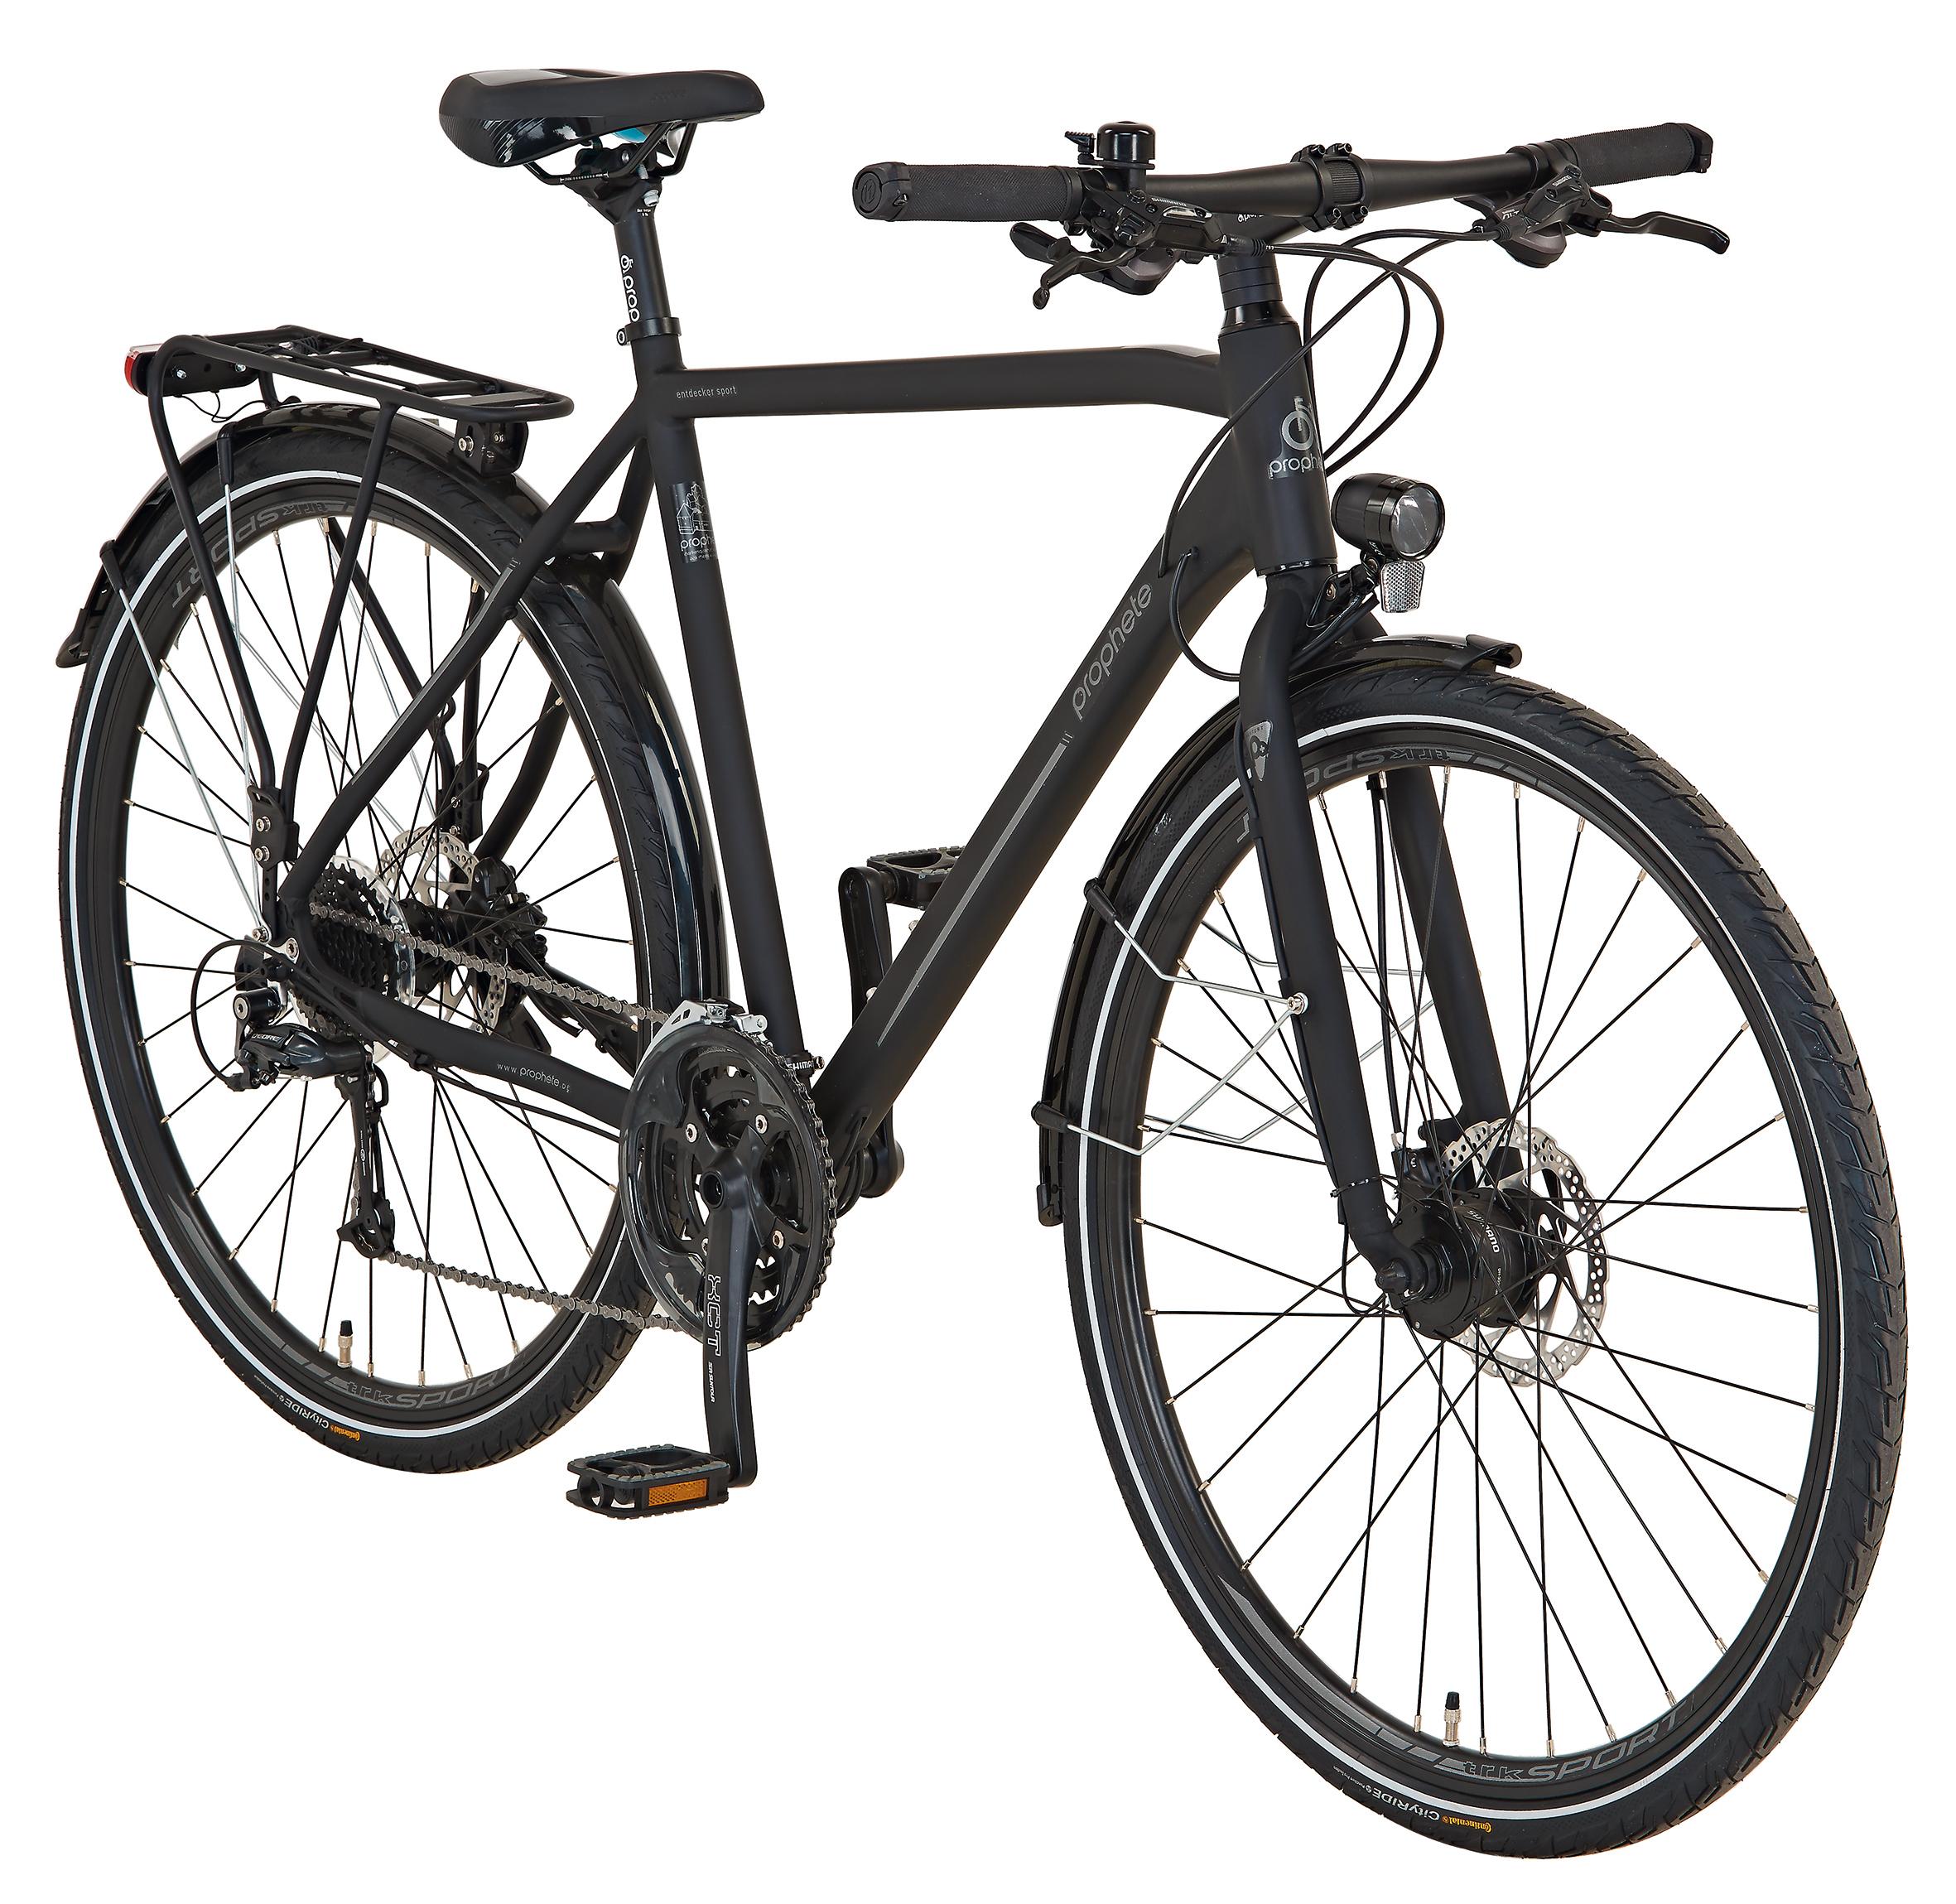 "Prophete Fahrrad / Trekkingrad Entdecker Sport Trekking Bike 28"" Herrn Bild 2"